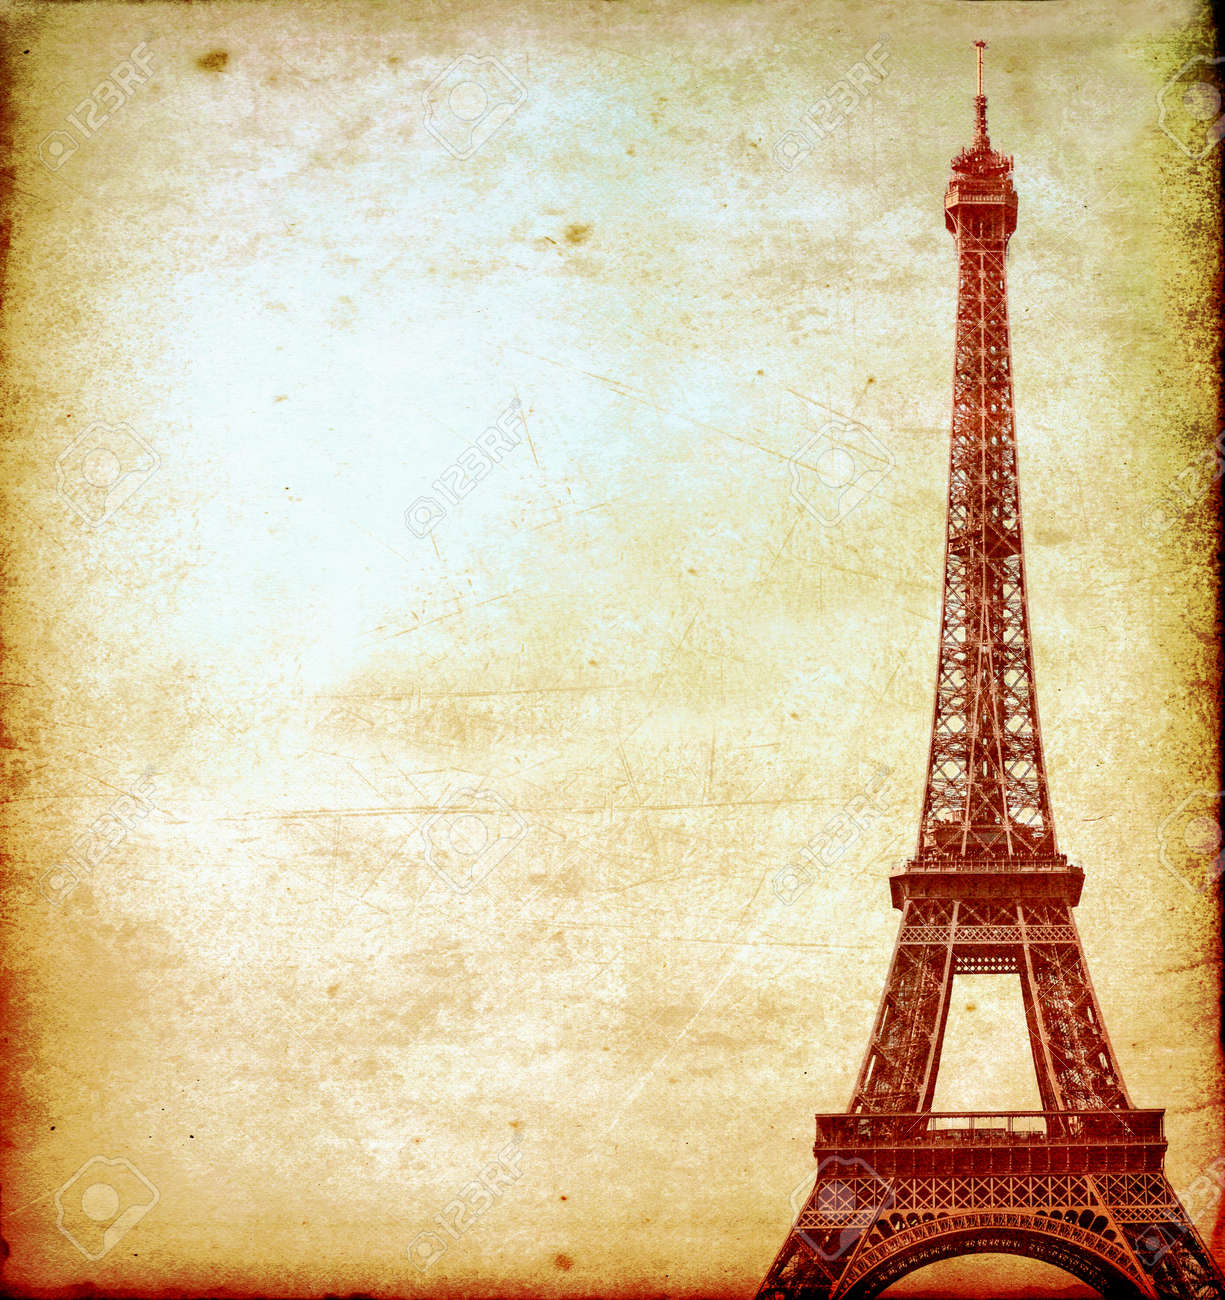 Eiffel tower vintage postcard stock photo picture and royalty eiffel tower vintage postcard stock photo 16402833 jeuxipadfo Images